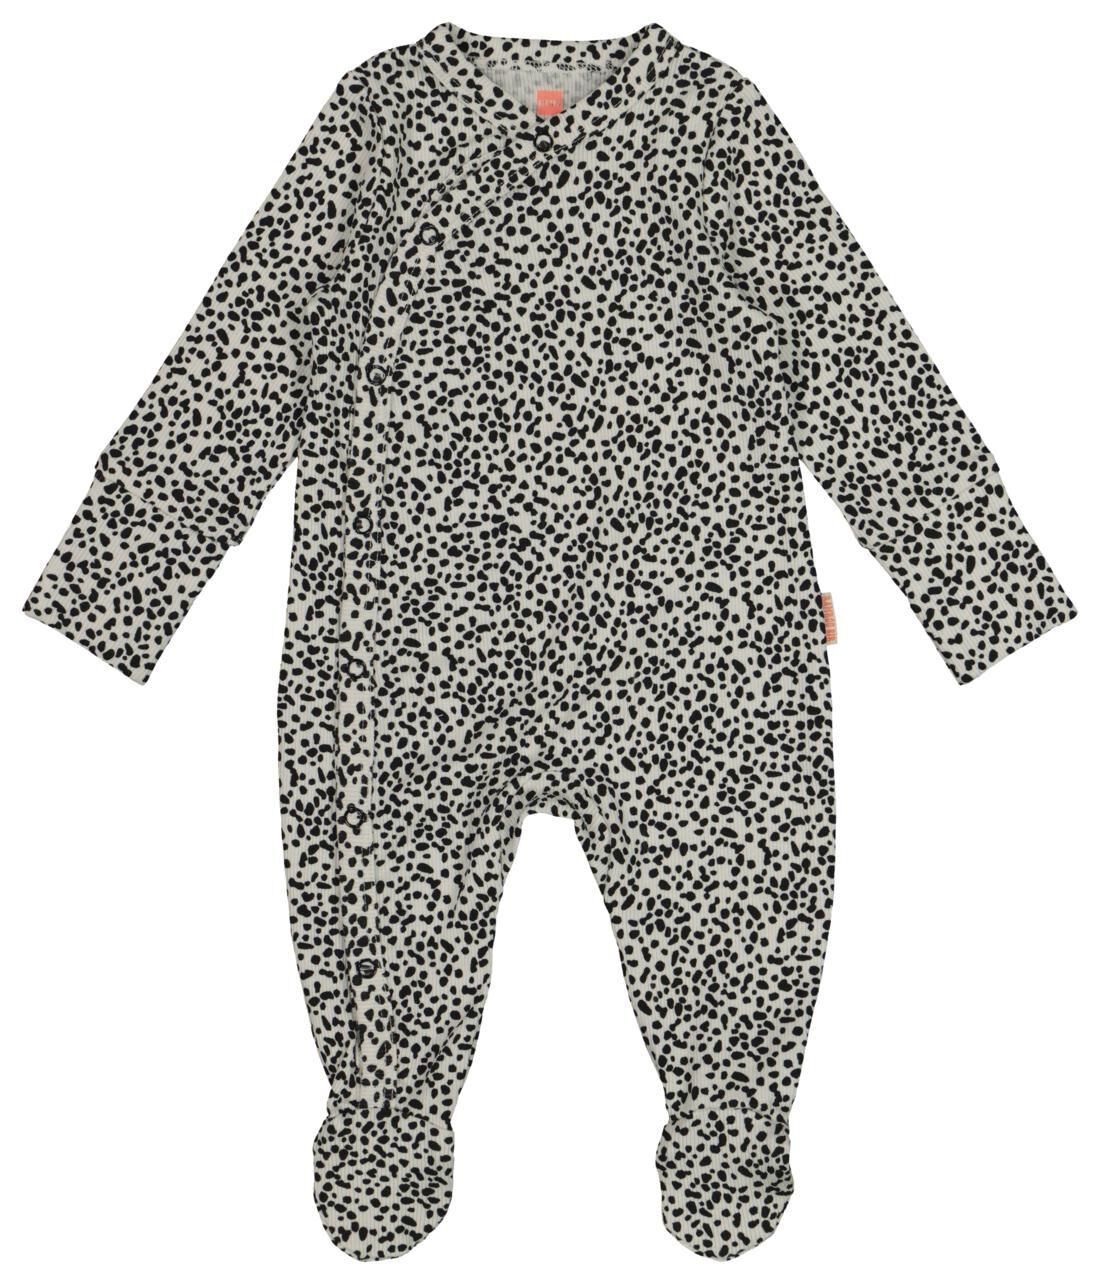 HEMA Newborn Jumpsuit Met Bamboe Zwart (zwart)